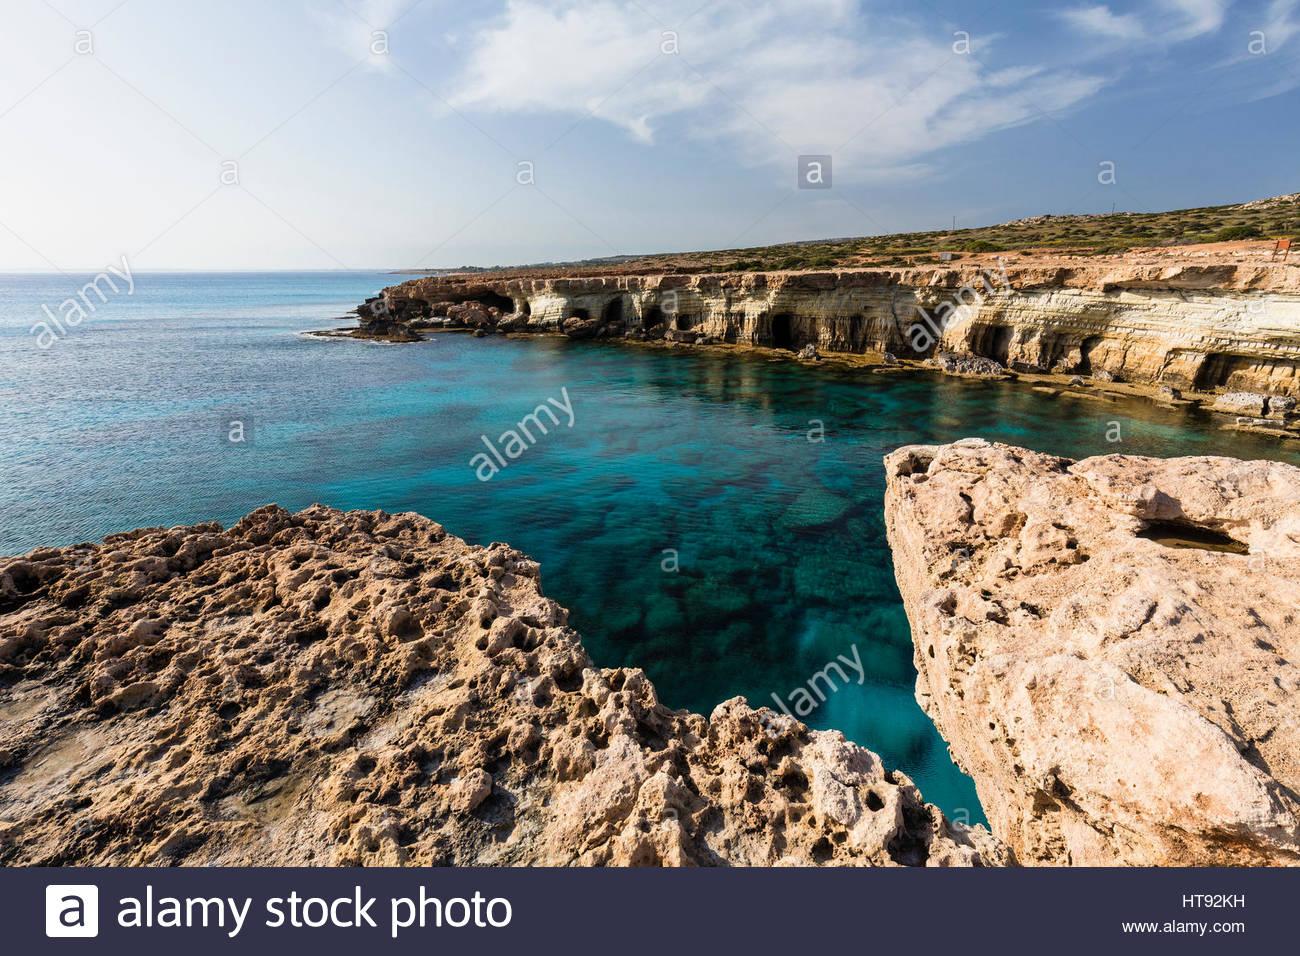 Küste mit Höhlen, Kap Greco, nationalen Waldpark, Agia Napa, Zypern Stockbild